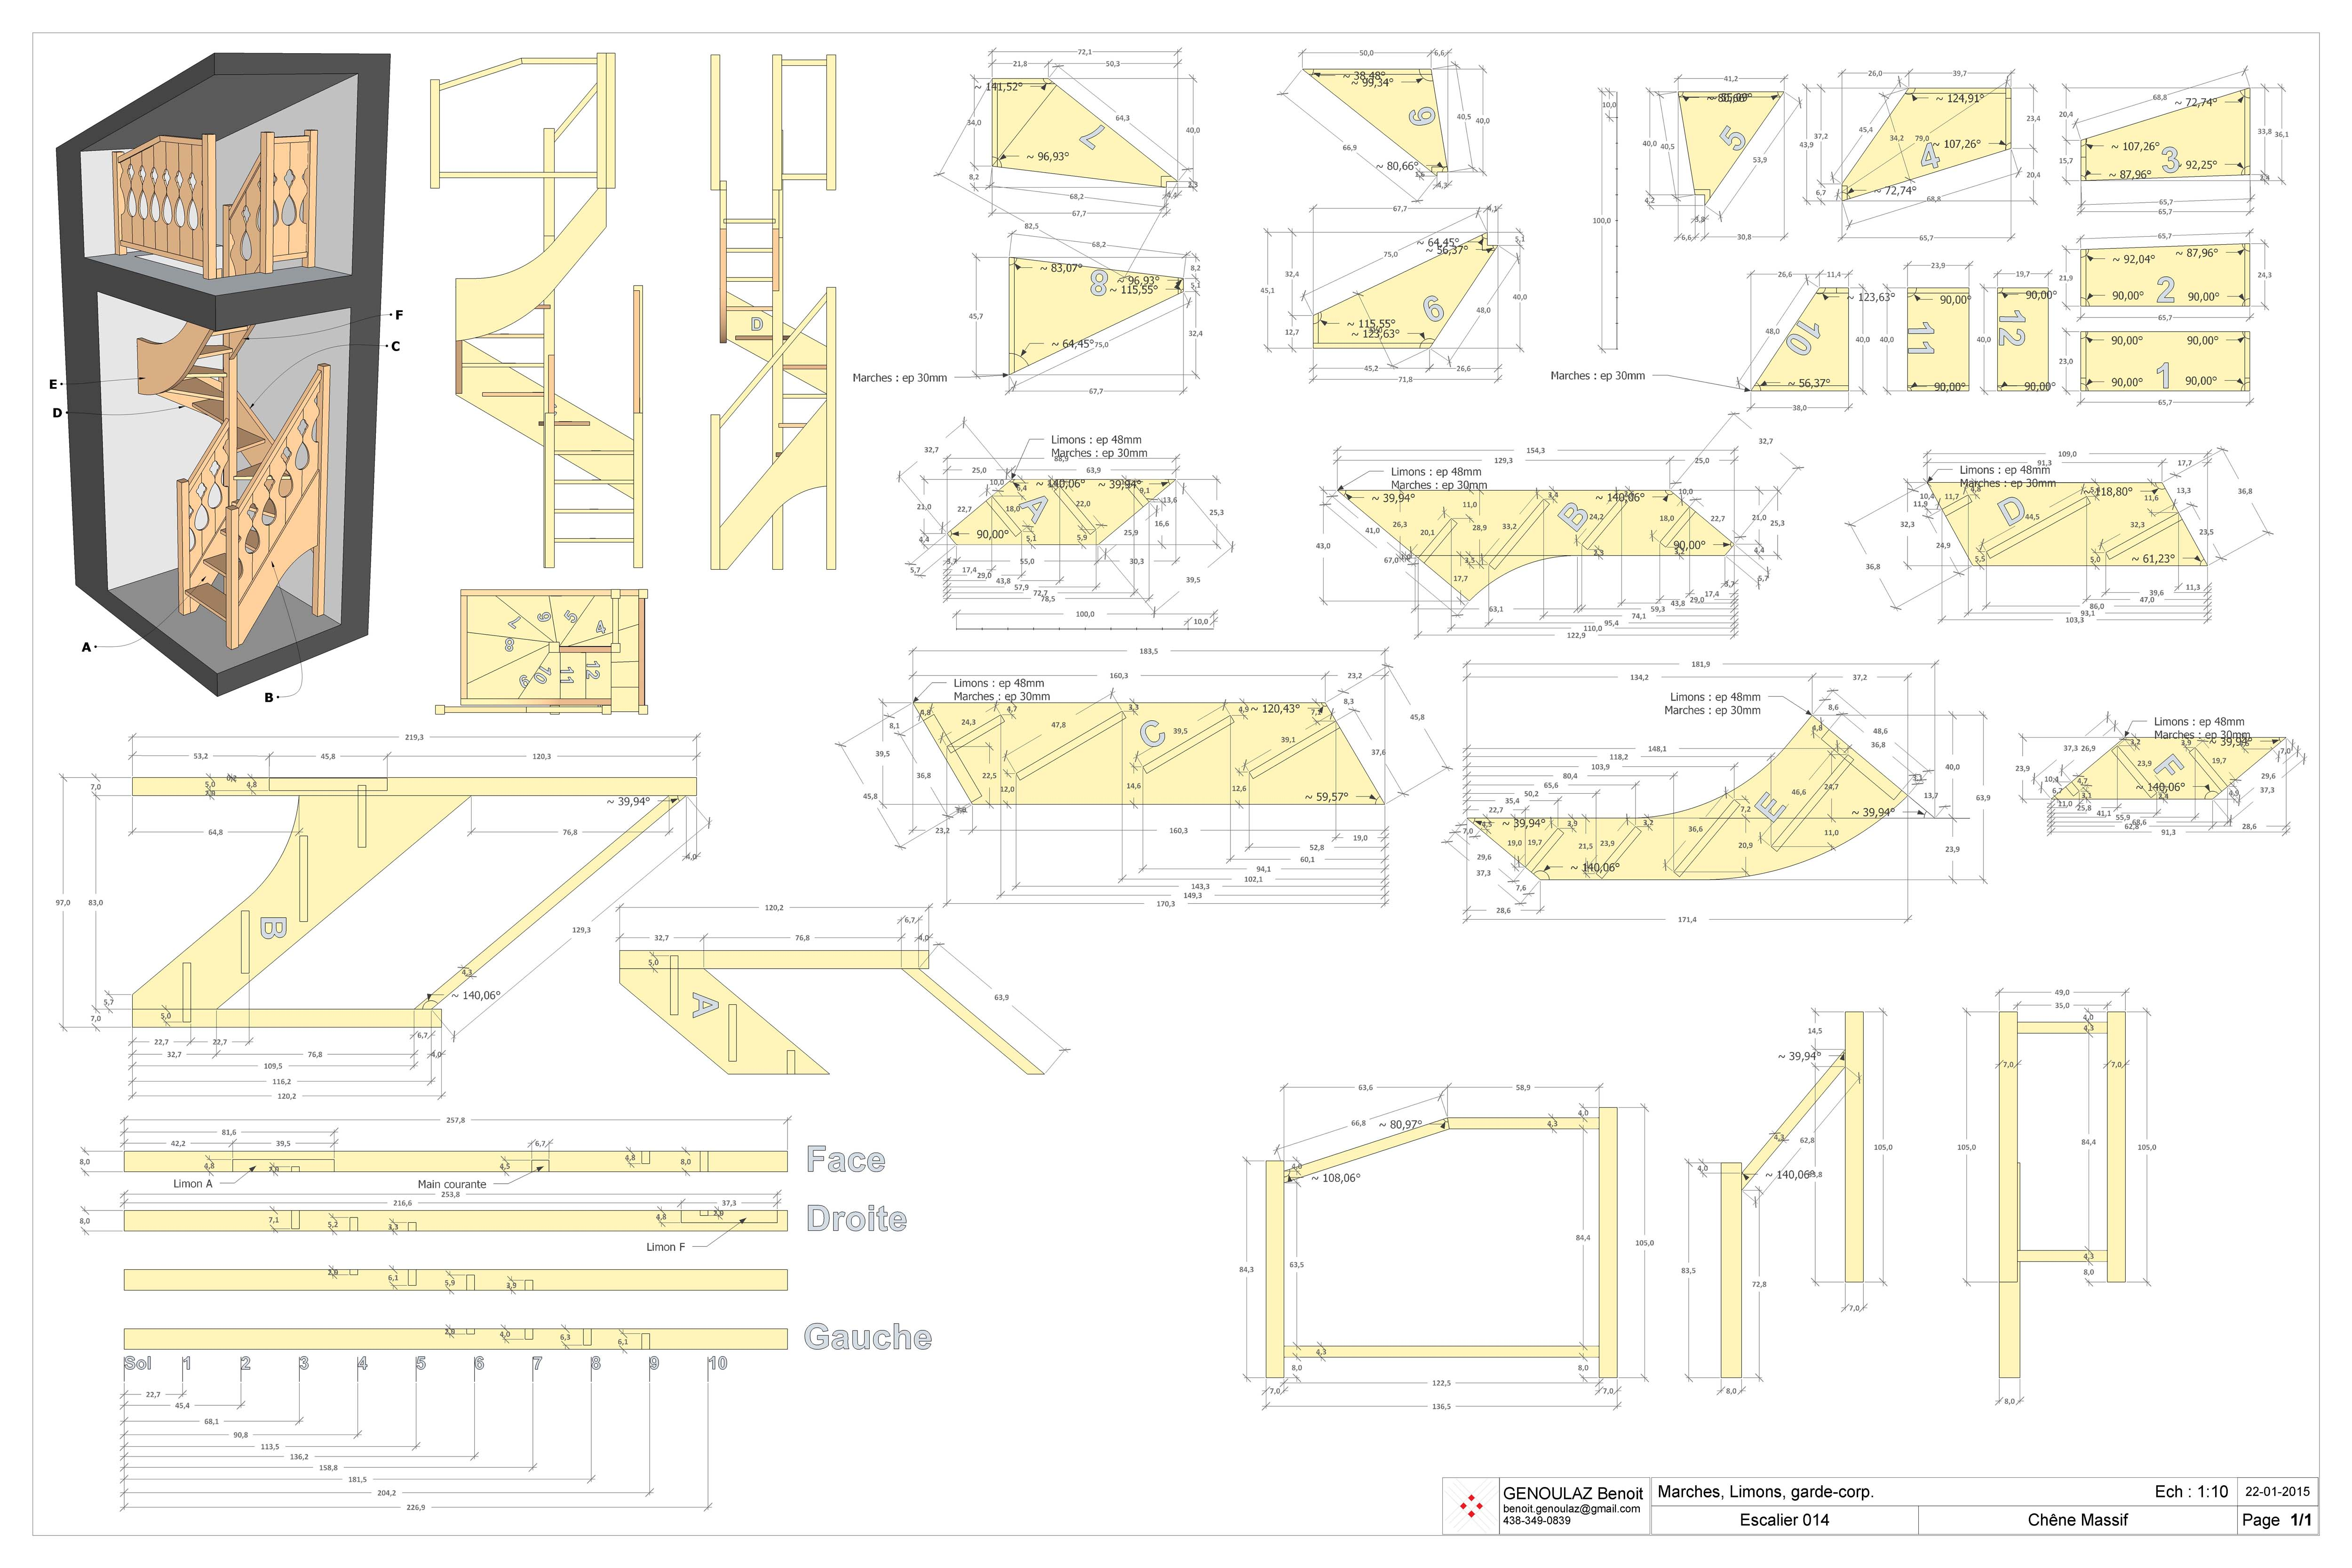 escalier 3 4 tournant visualisation 3d architecturale. Black Bedroom Furniture Sets. Home Design Ideas